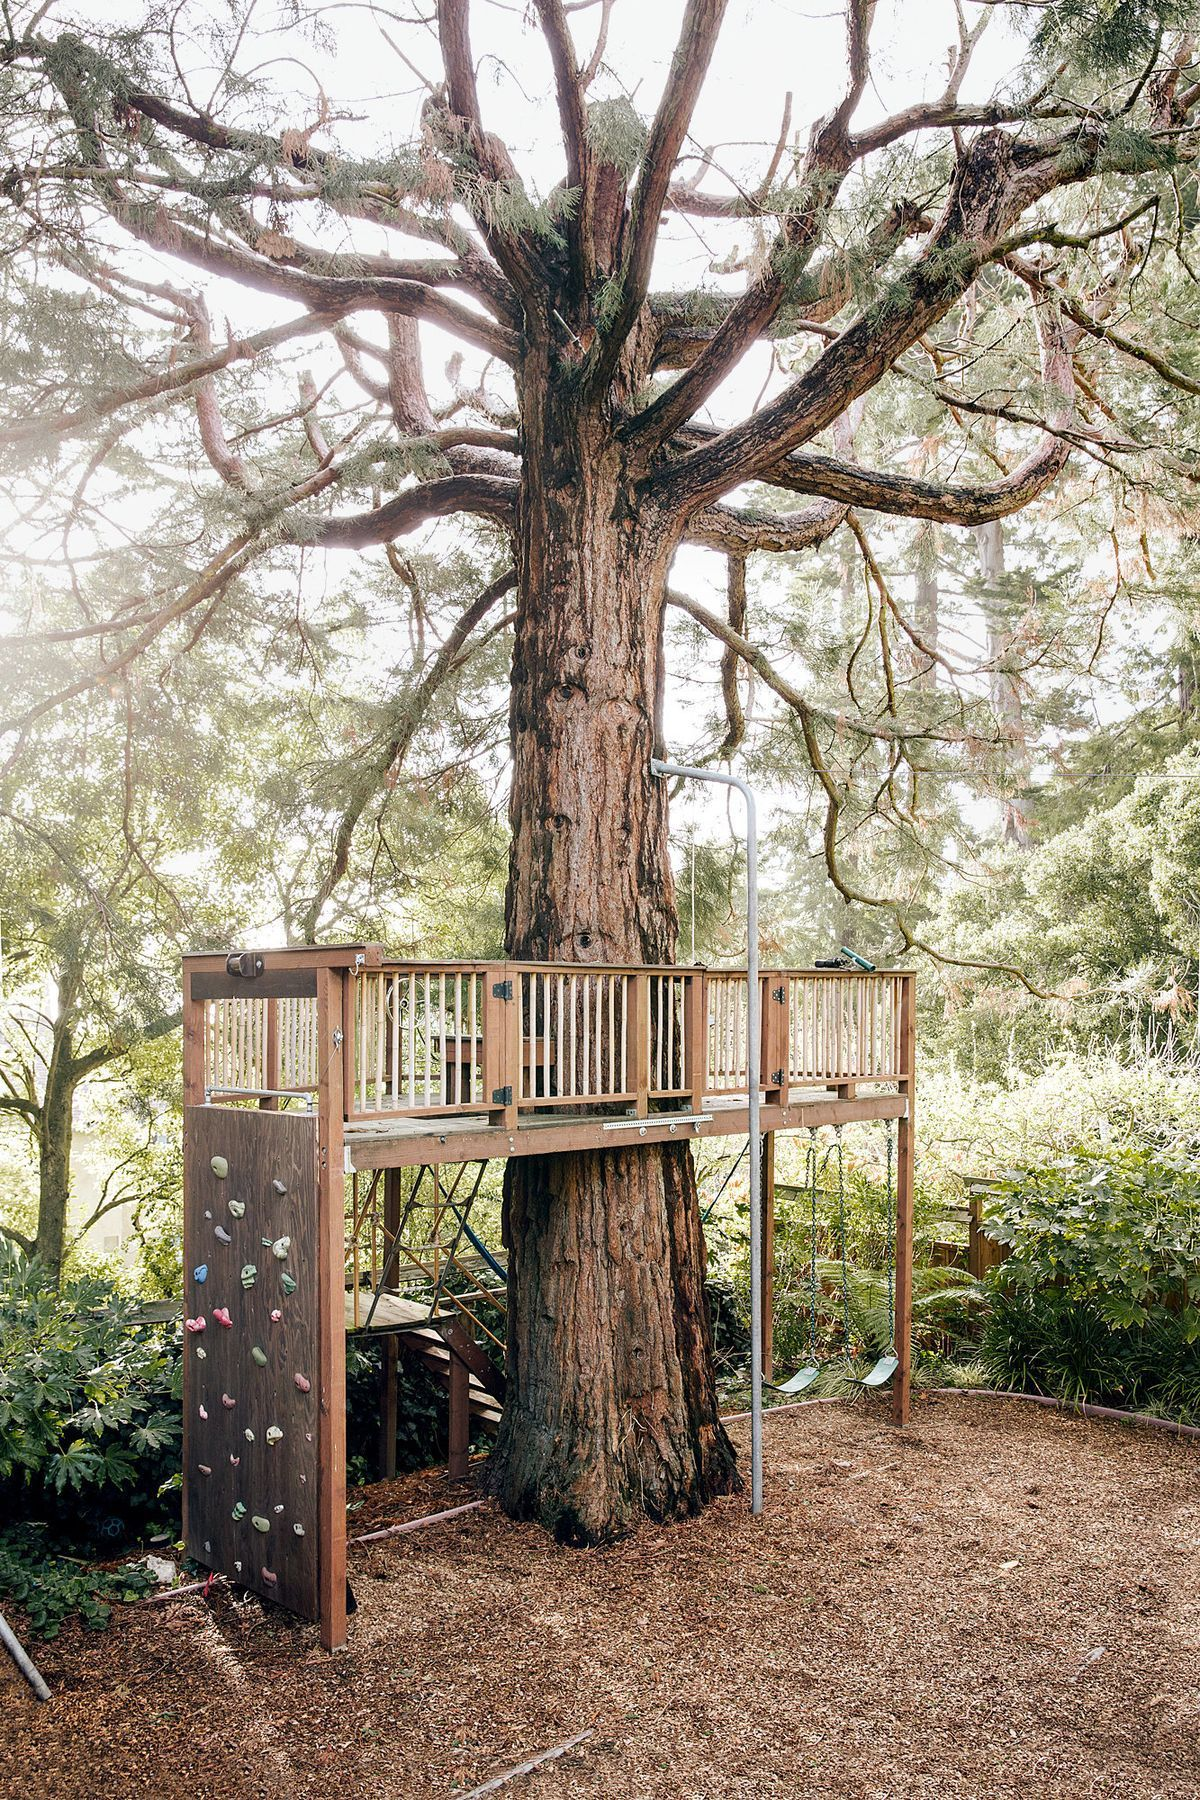 21 Unbeliavably Amazing Treehouse Ideas that Will Inspire ...